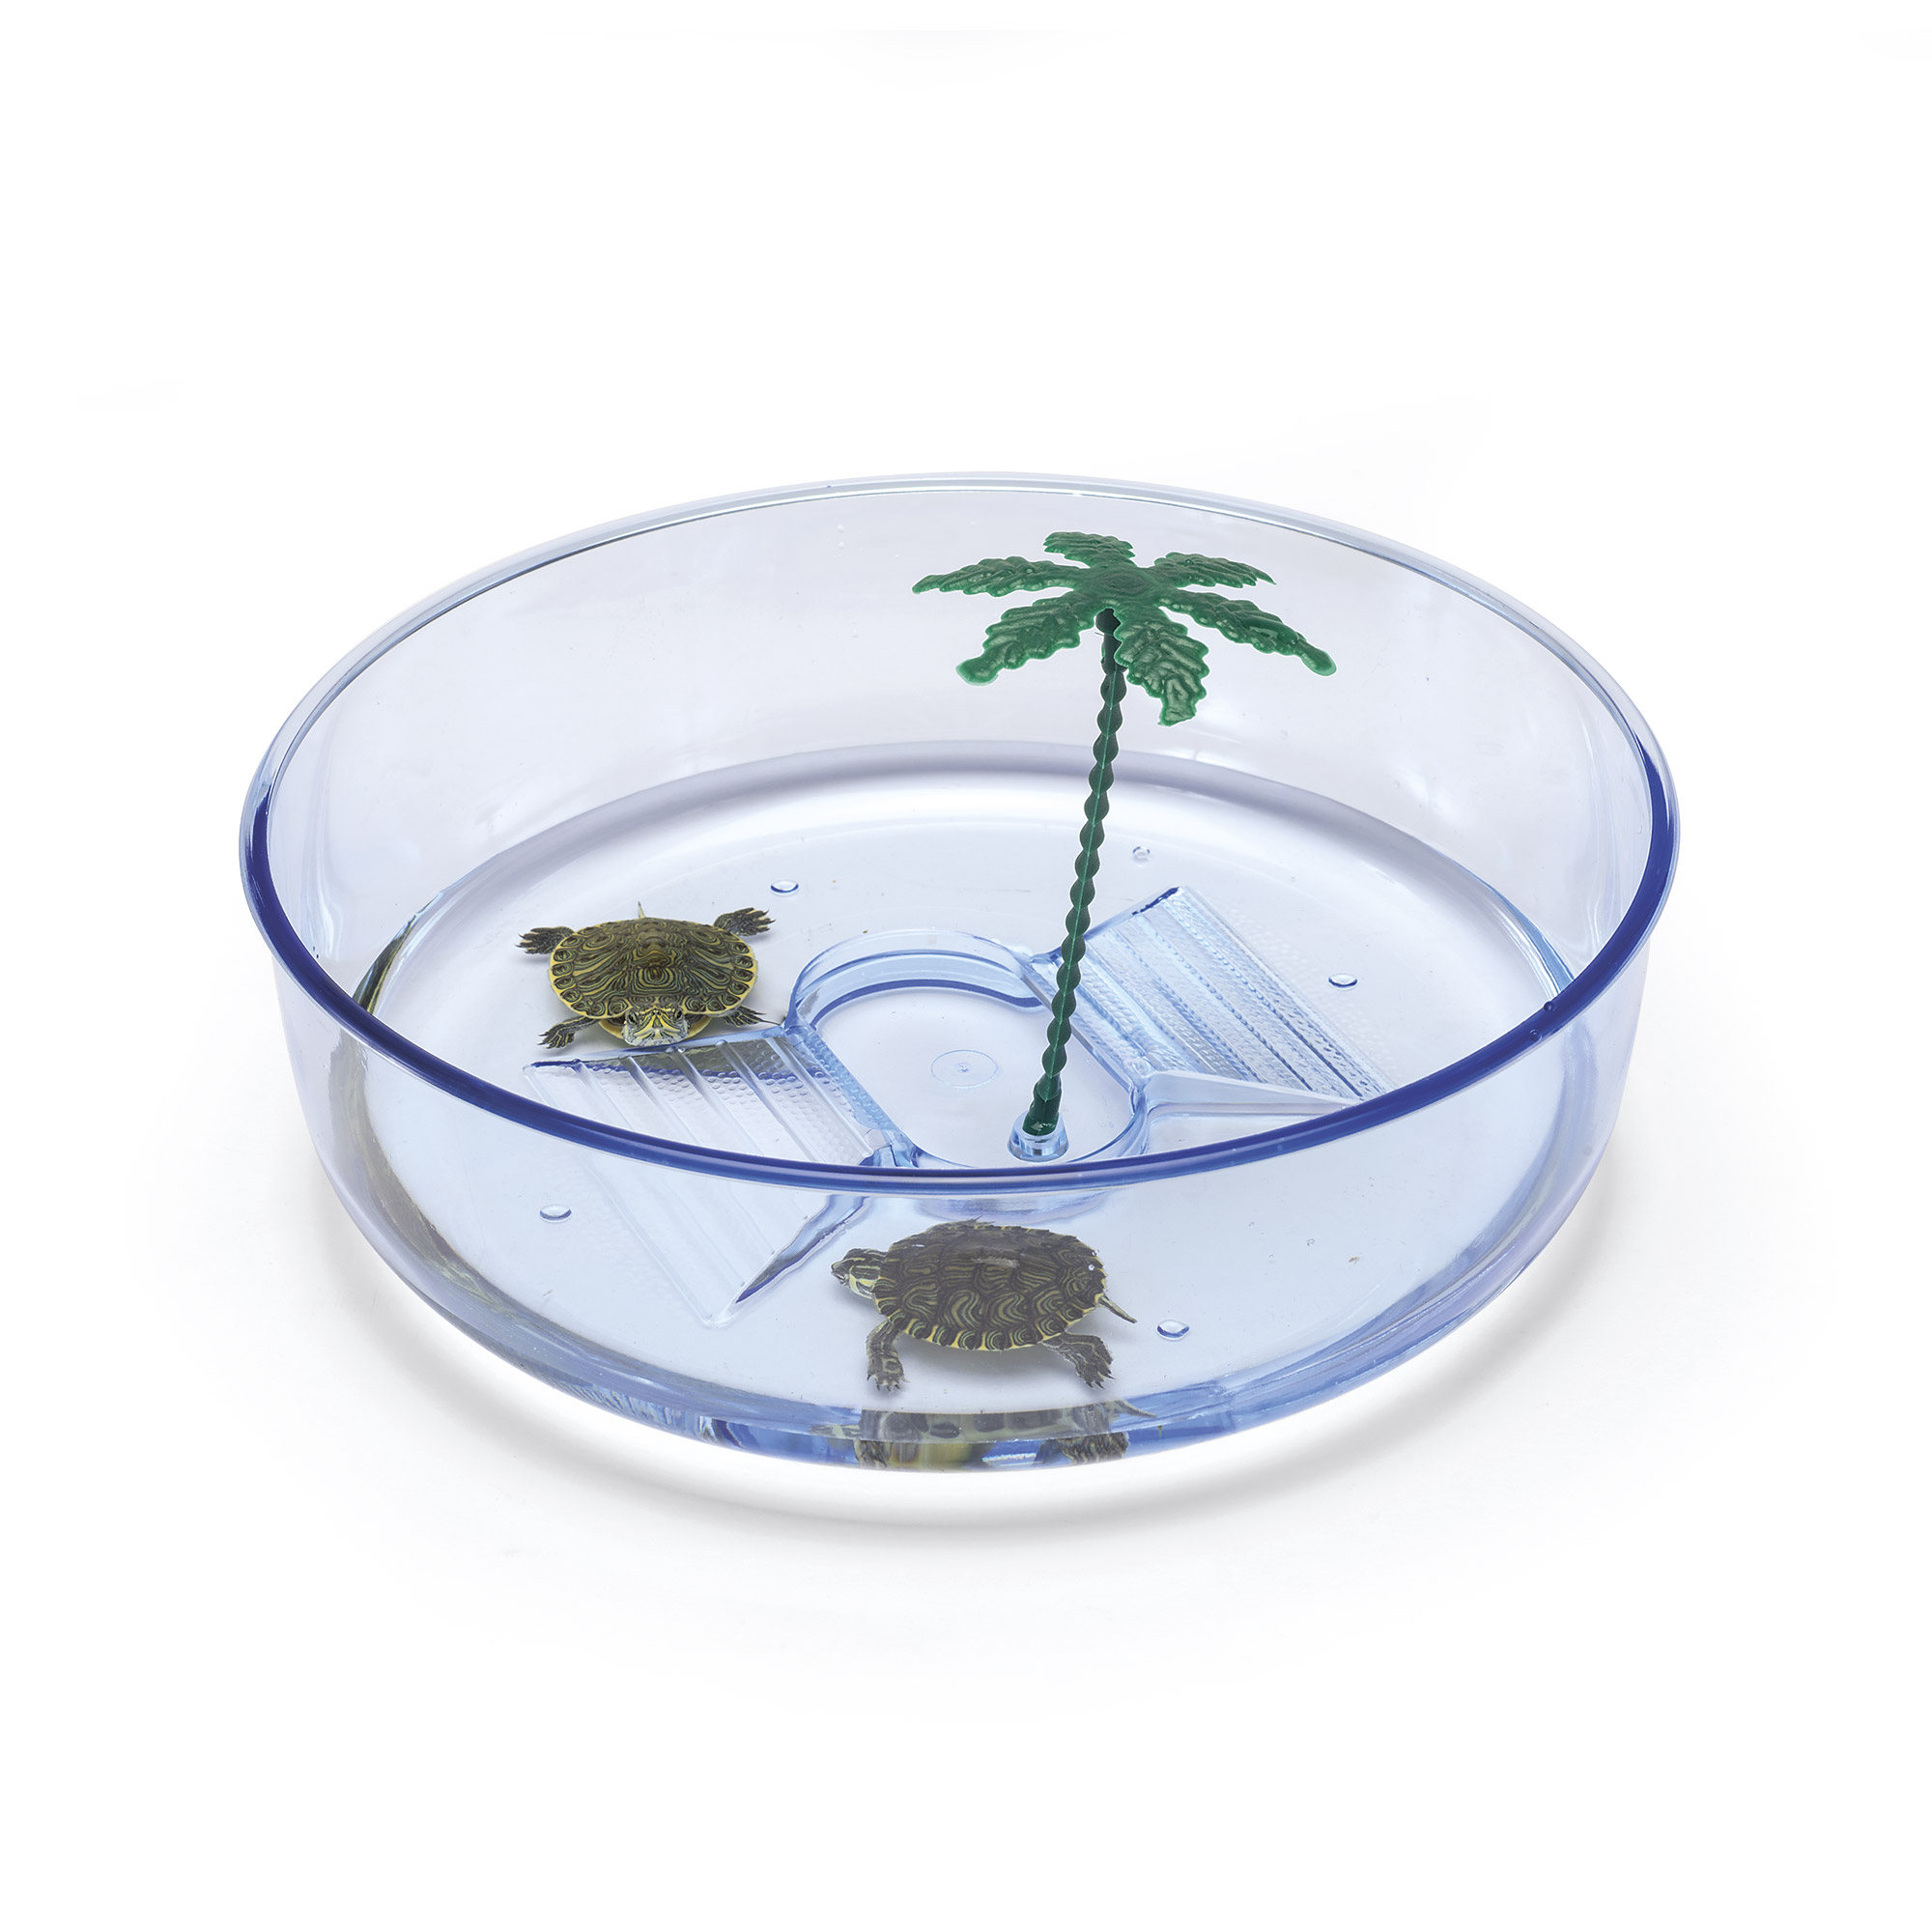 Prodotti per tartarughe turtle hydra for Tartarughe vaschetta